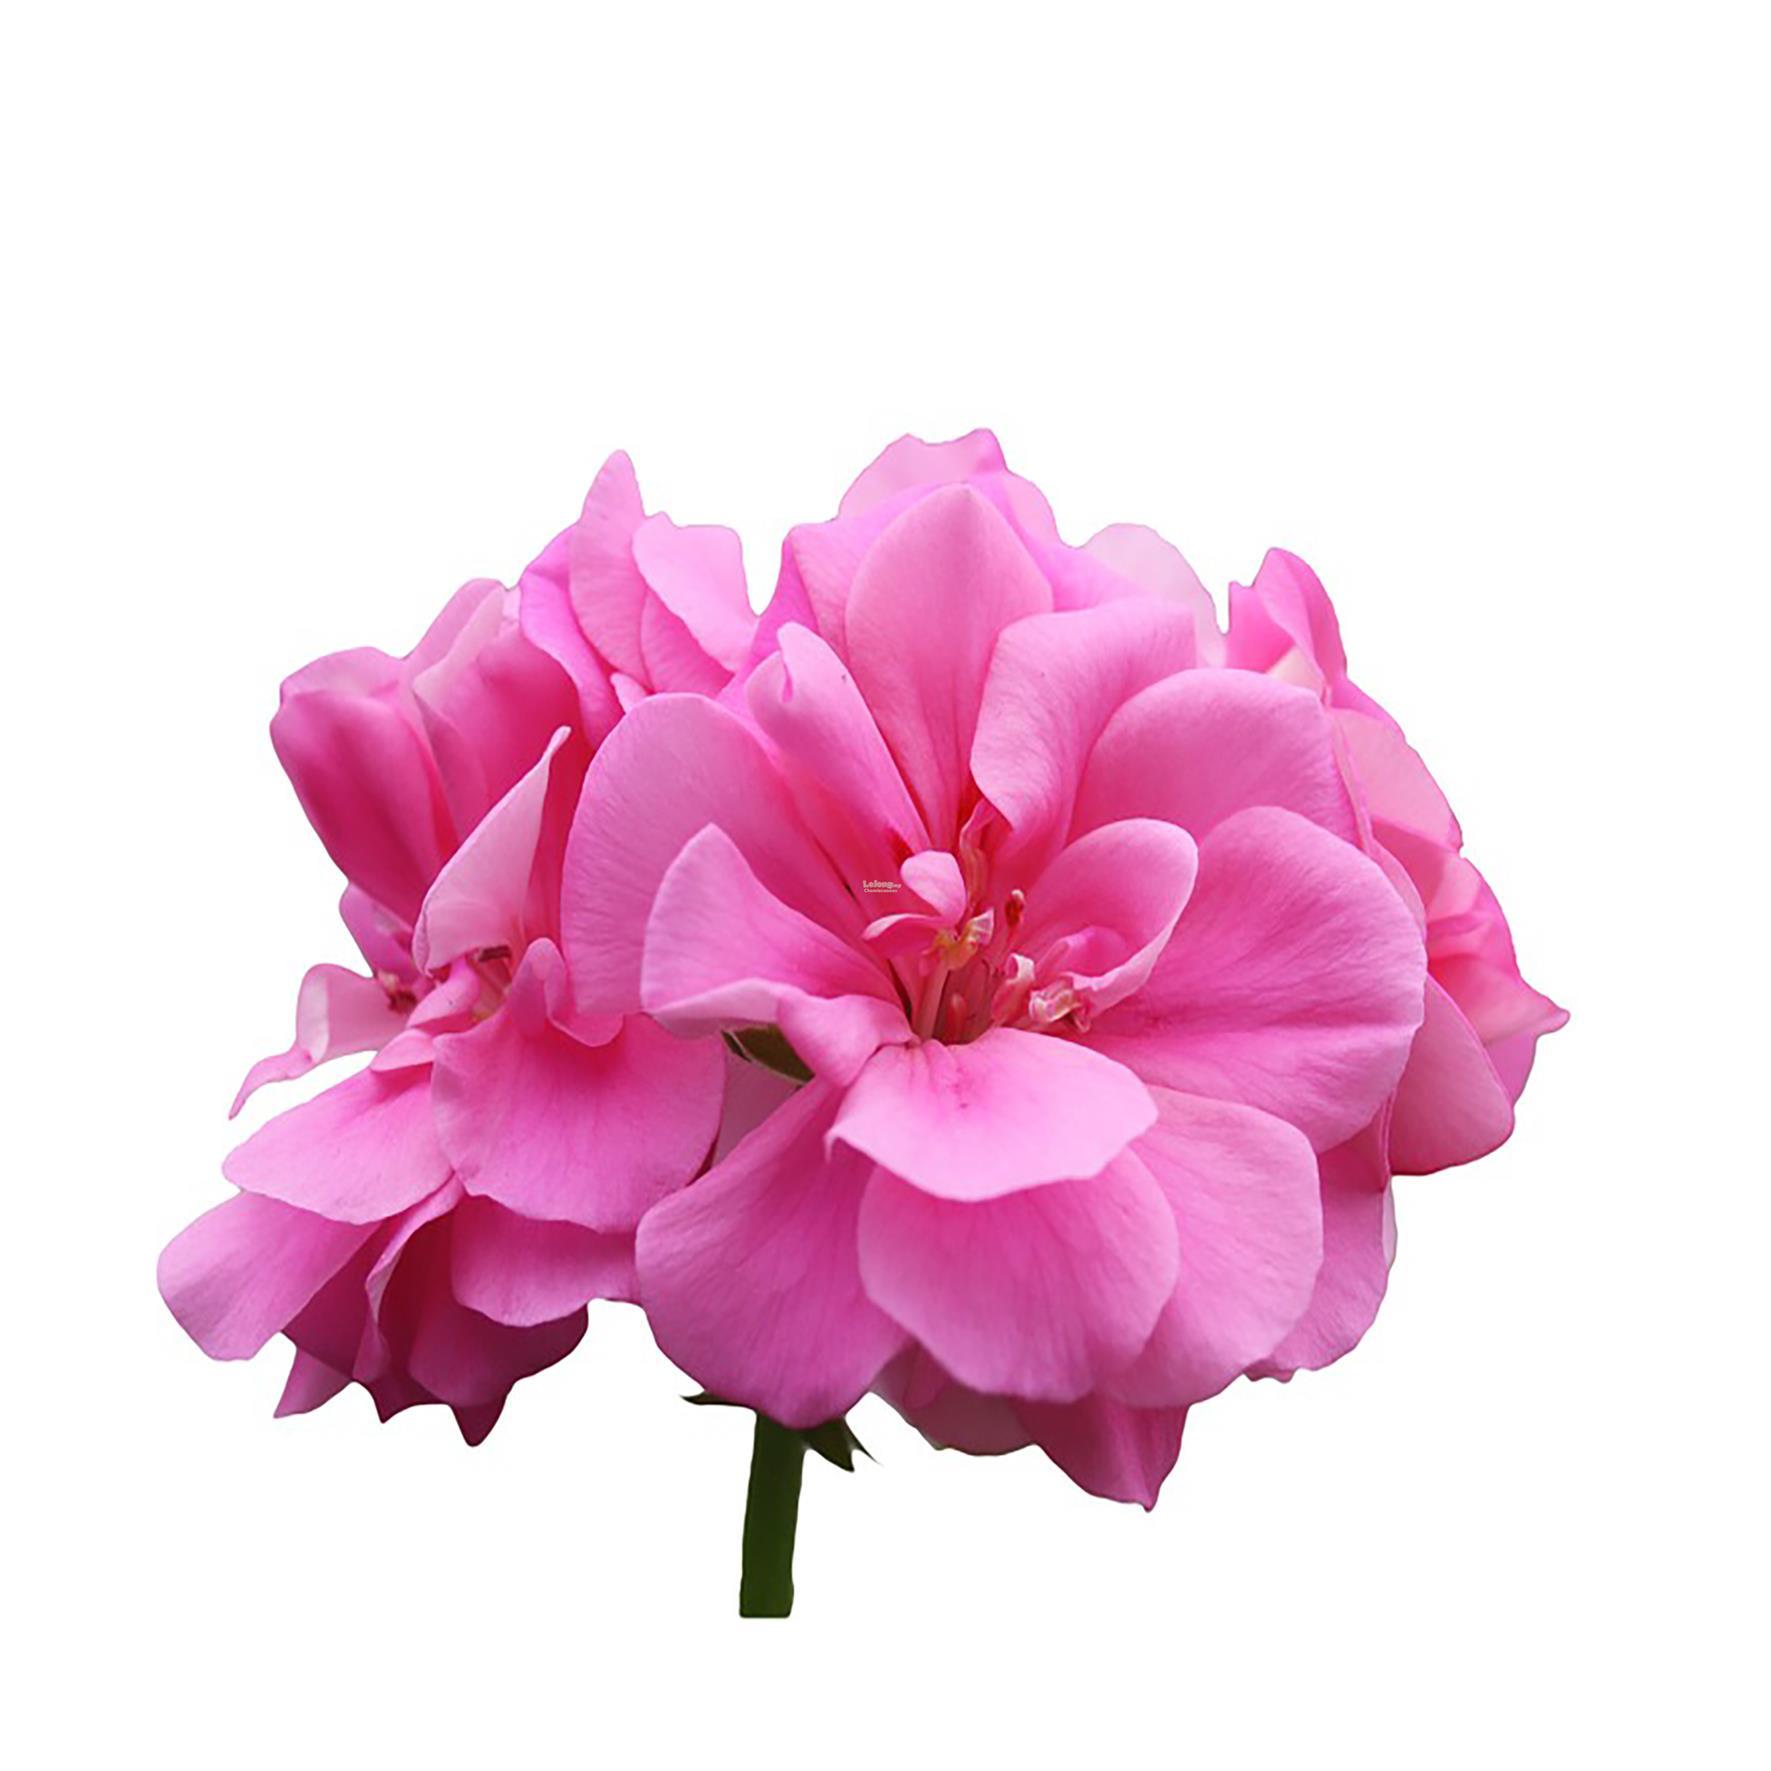 Rose Geranium Oil/Eygpt 10ml (end 10/21/2020 10:15 AM)